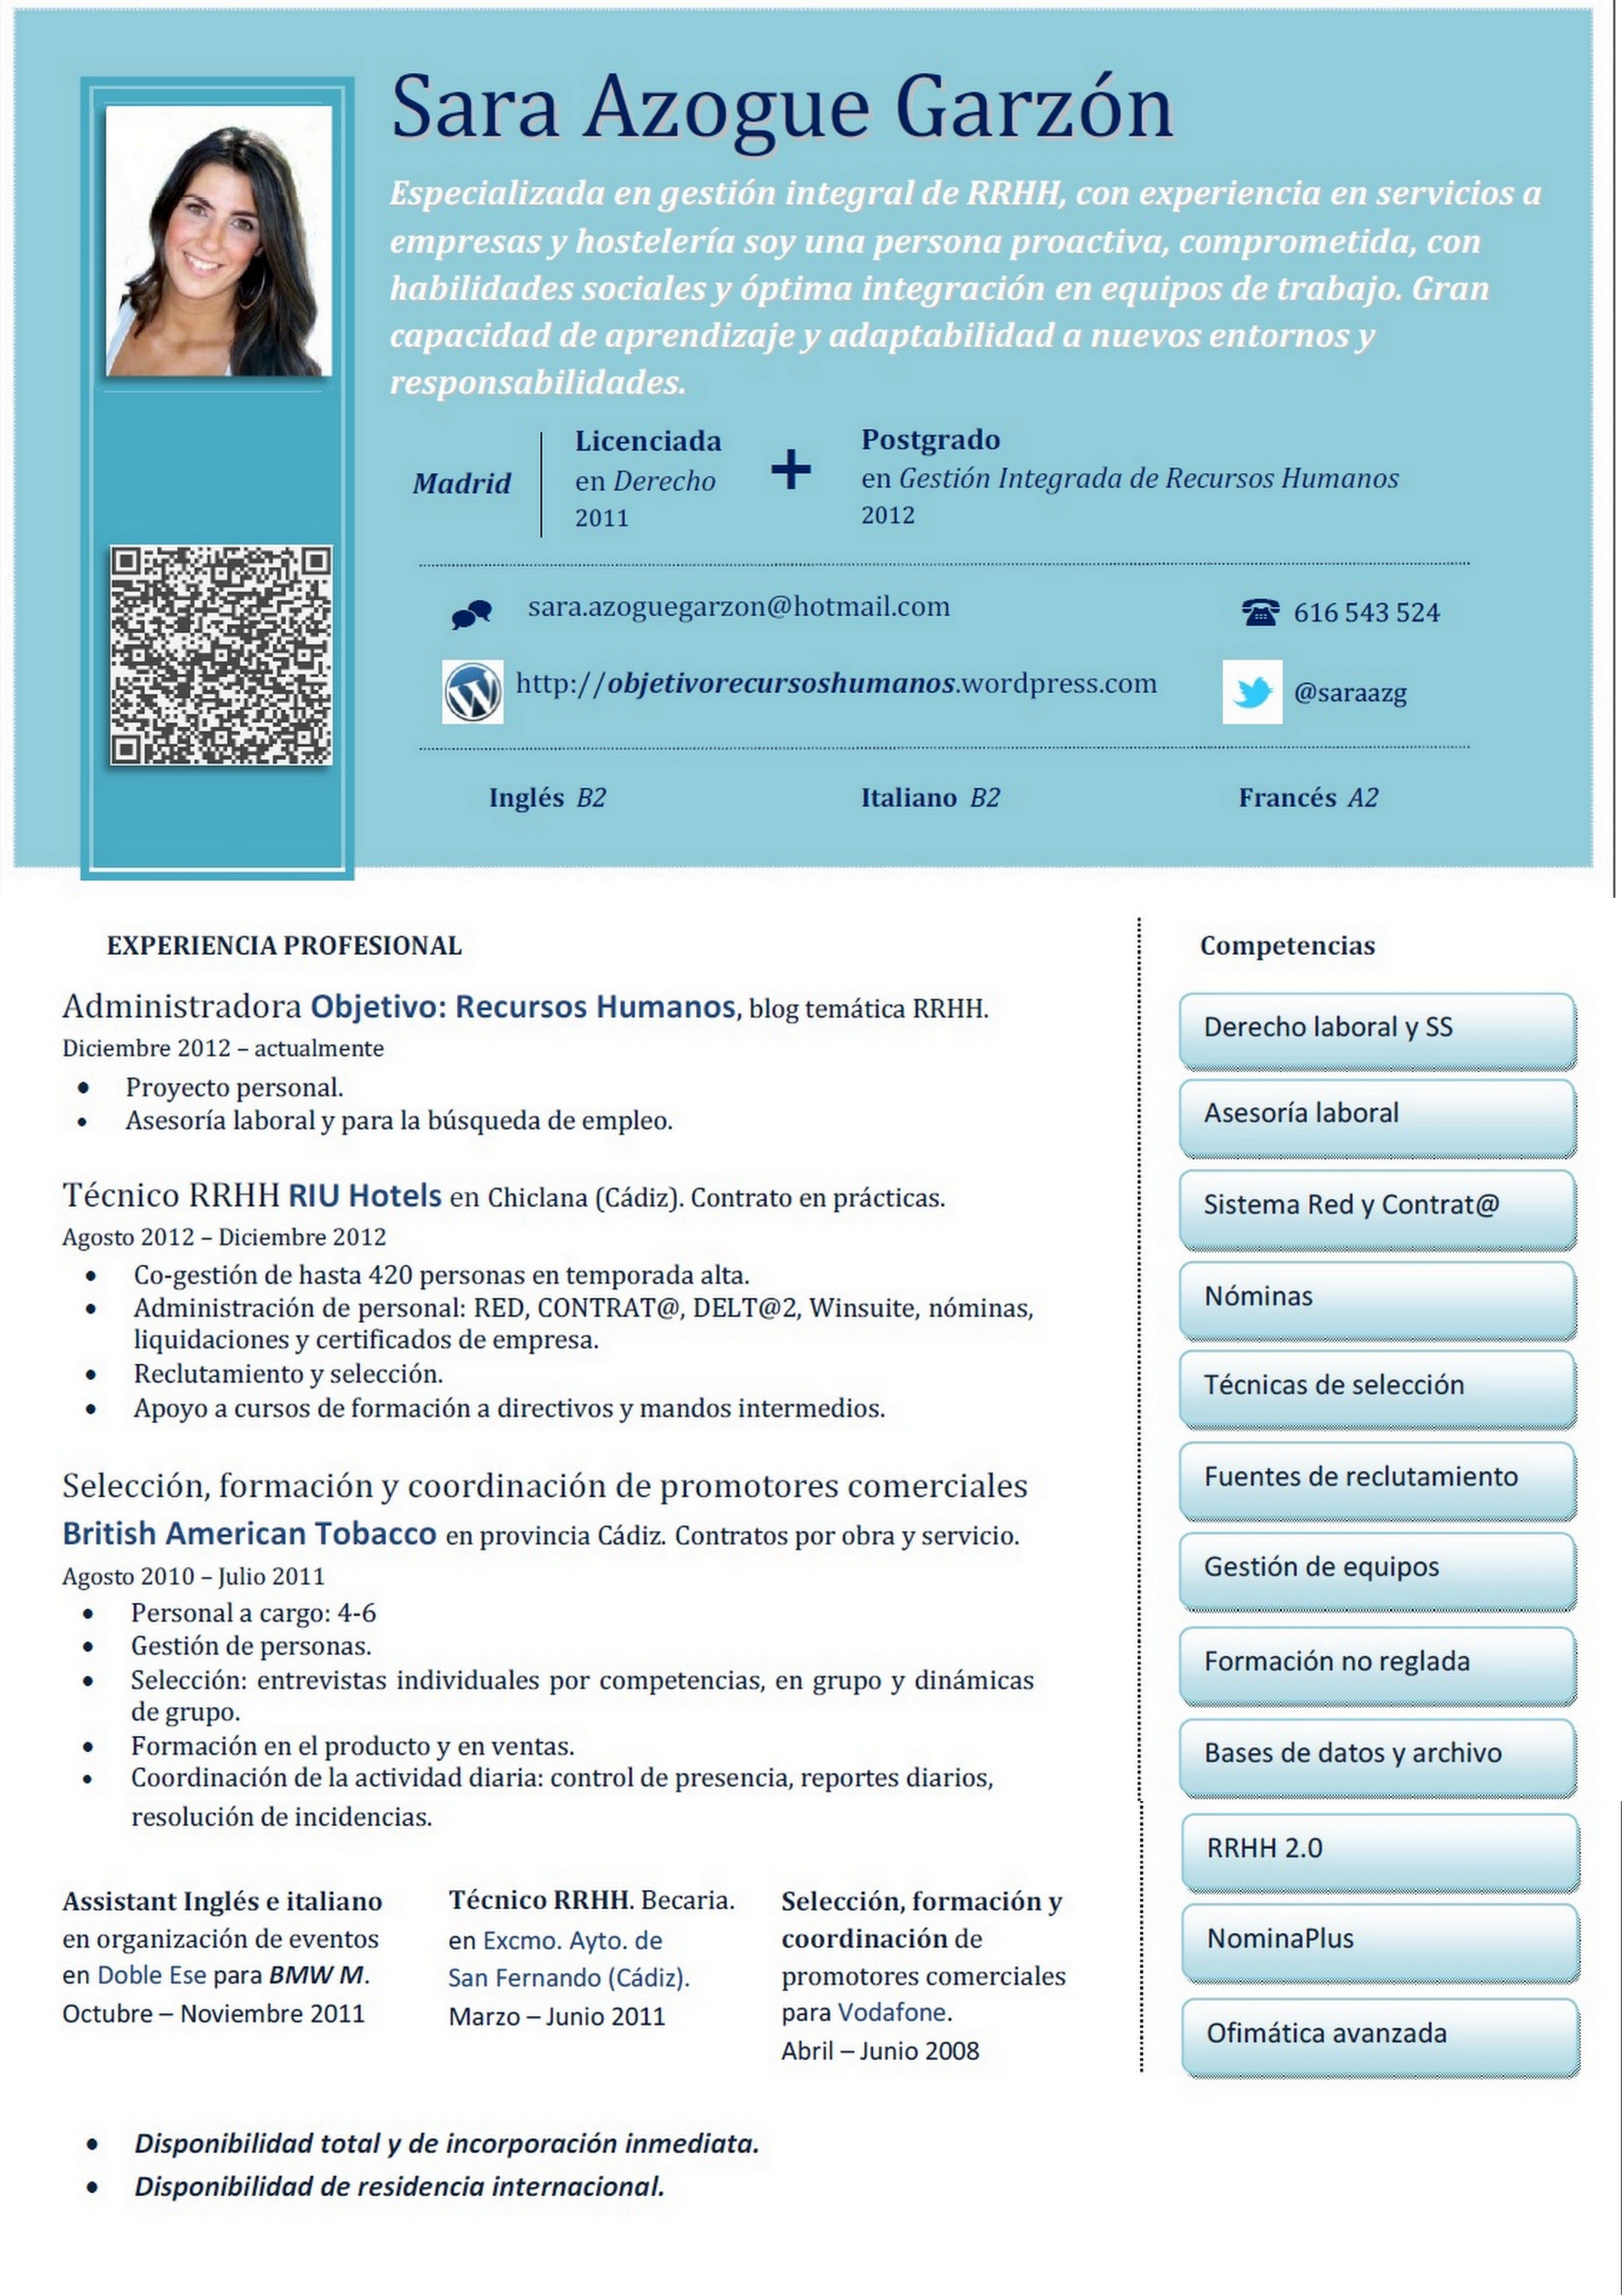 Modelo De Curriculum Vitae Por Competencias Modelo De Curriculum Vitae Modelos De Curriculum Vitae Curriculum Vitae Tipos De Curriculum